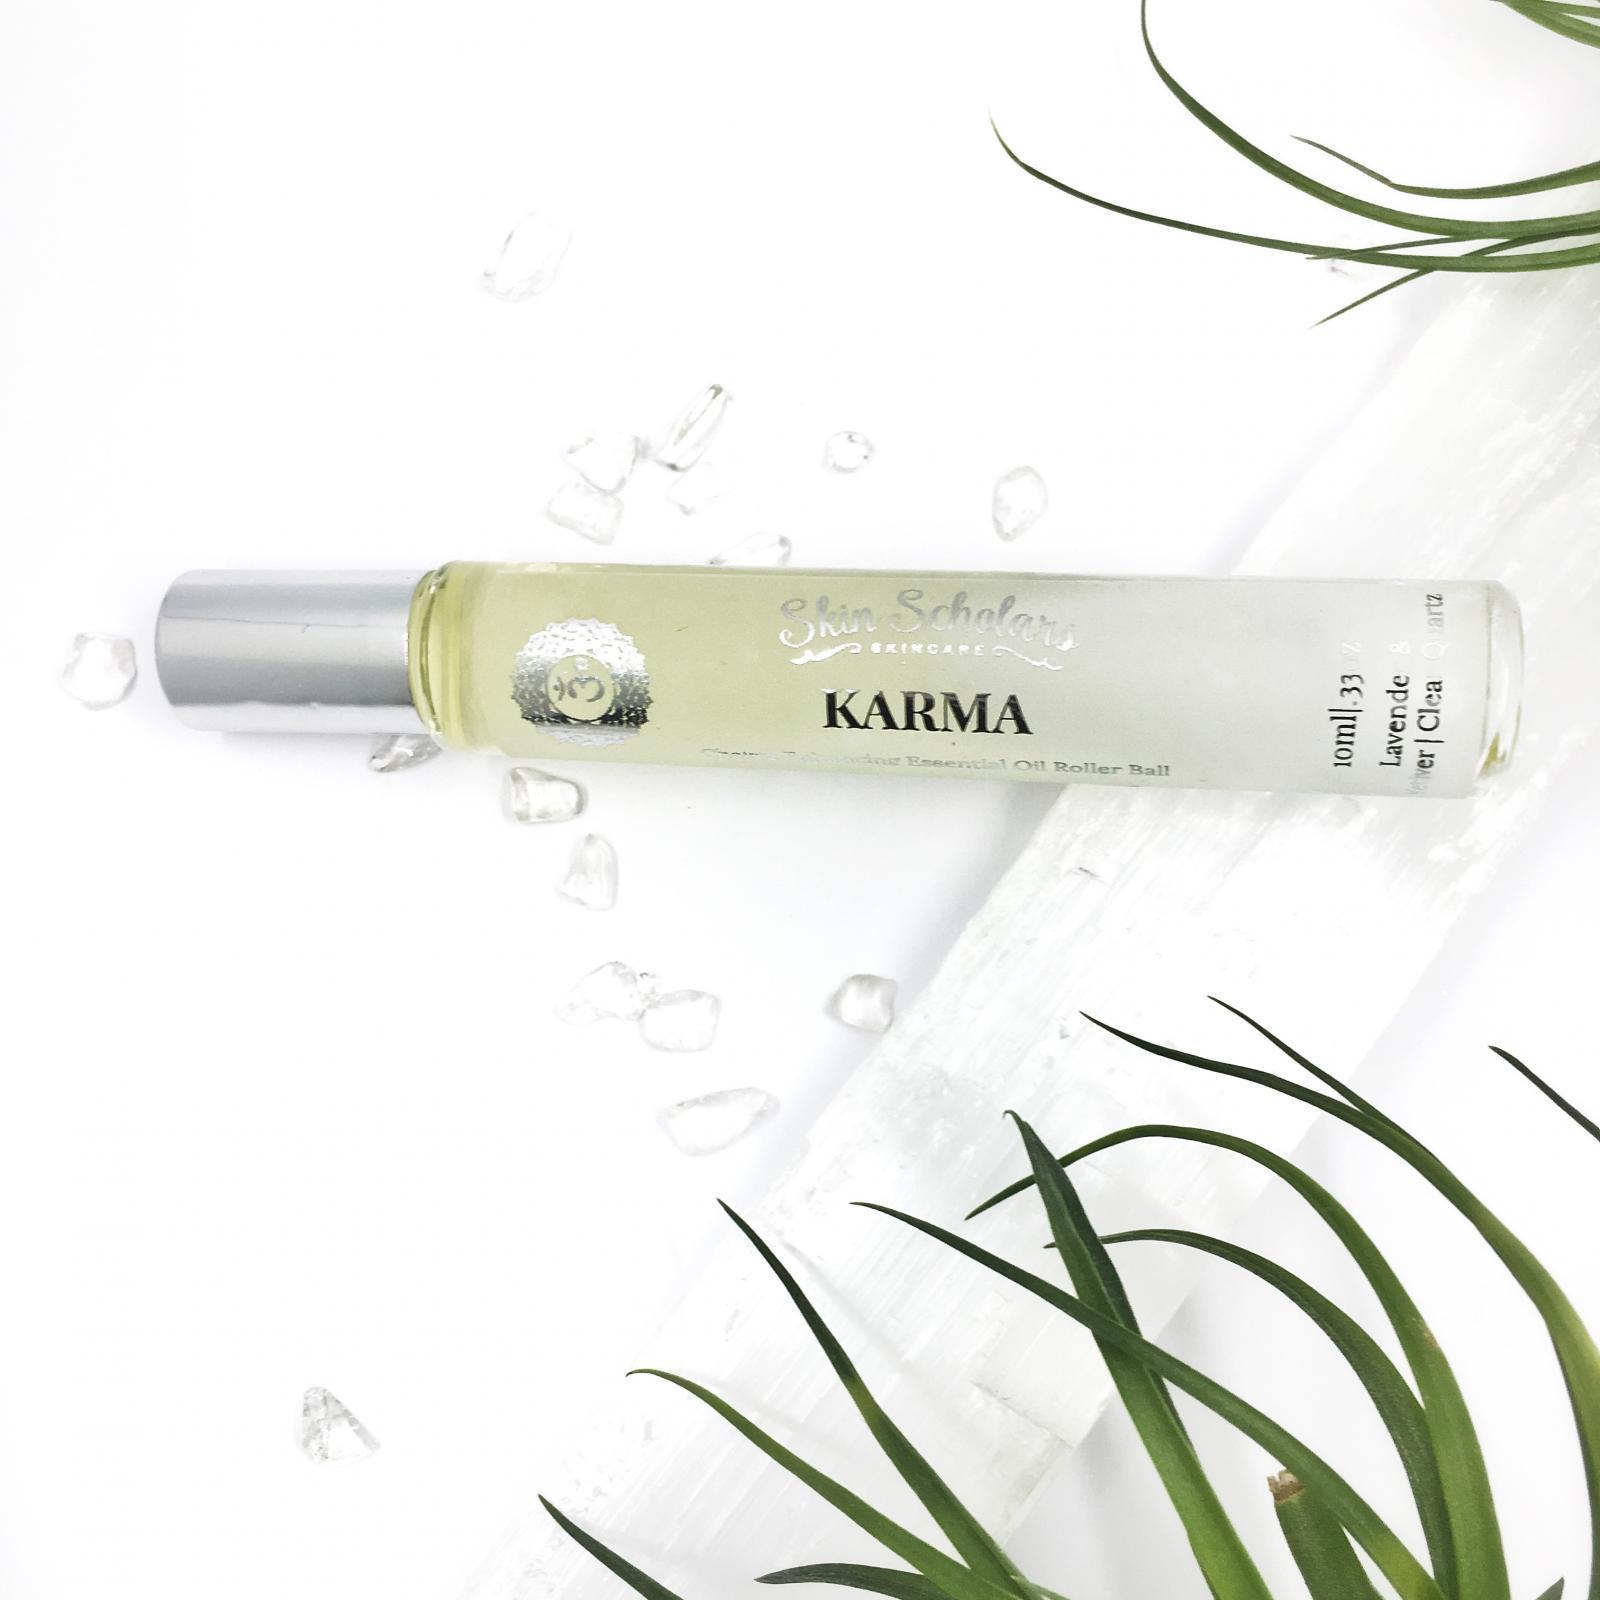 Karma Chakra Enhancing Essential Oil Roller Ball